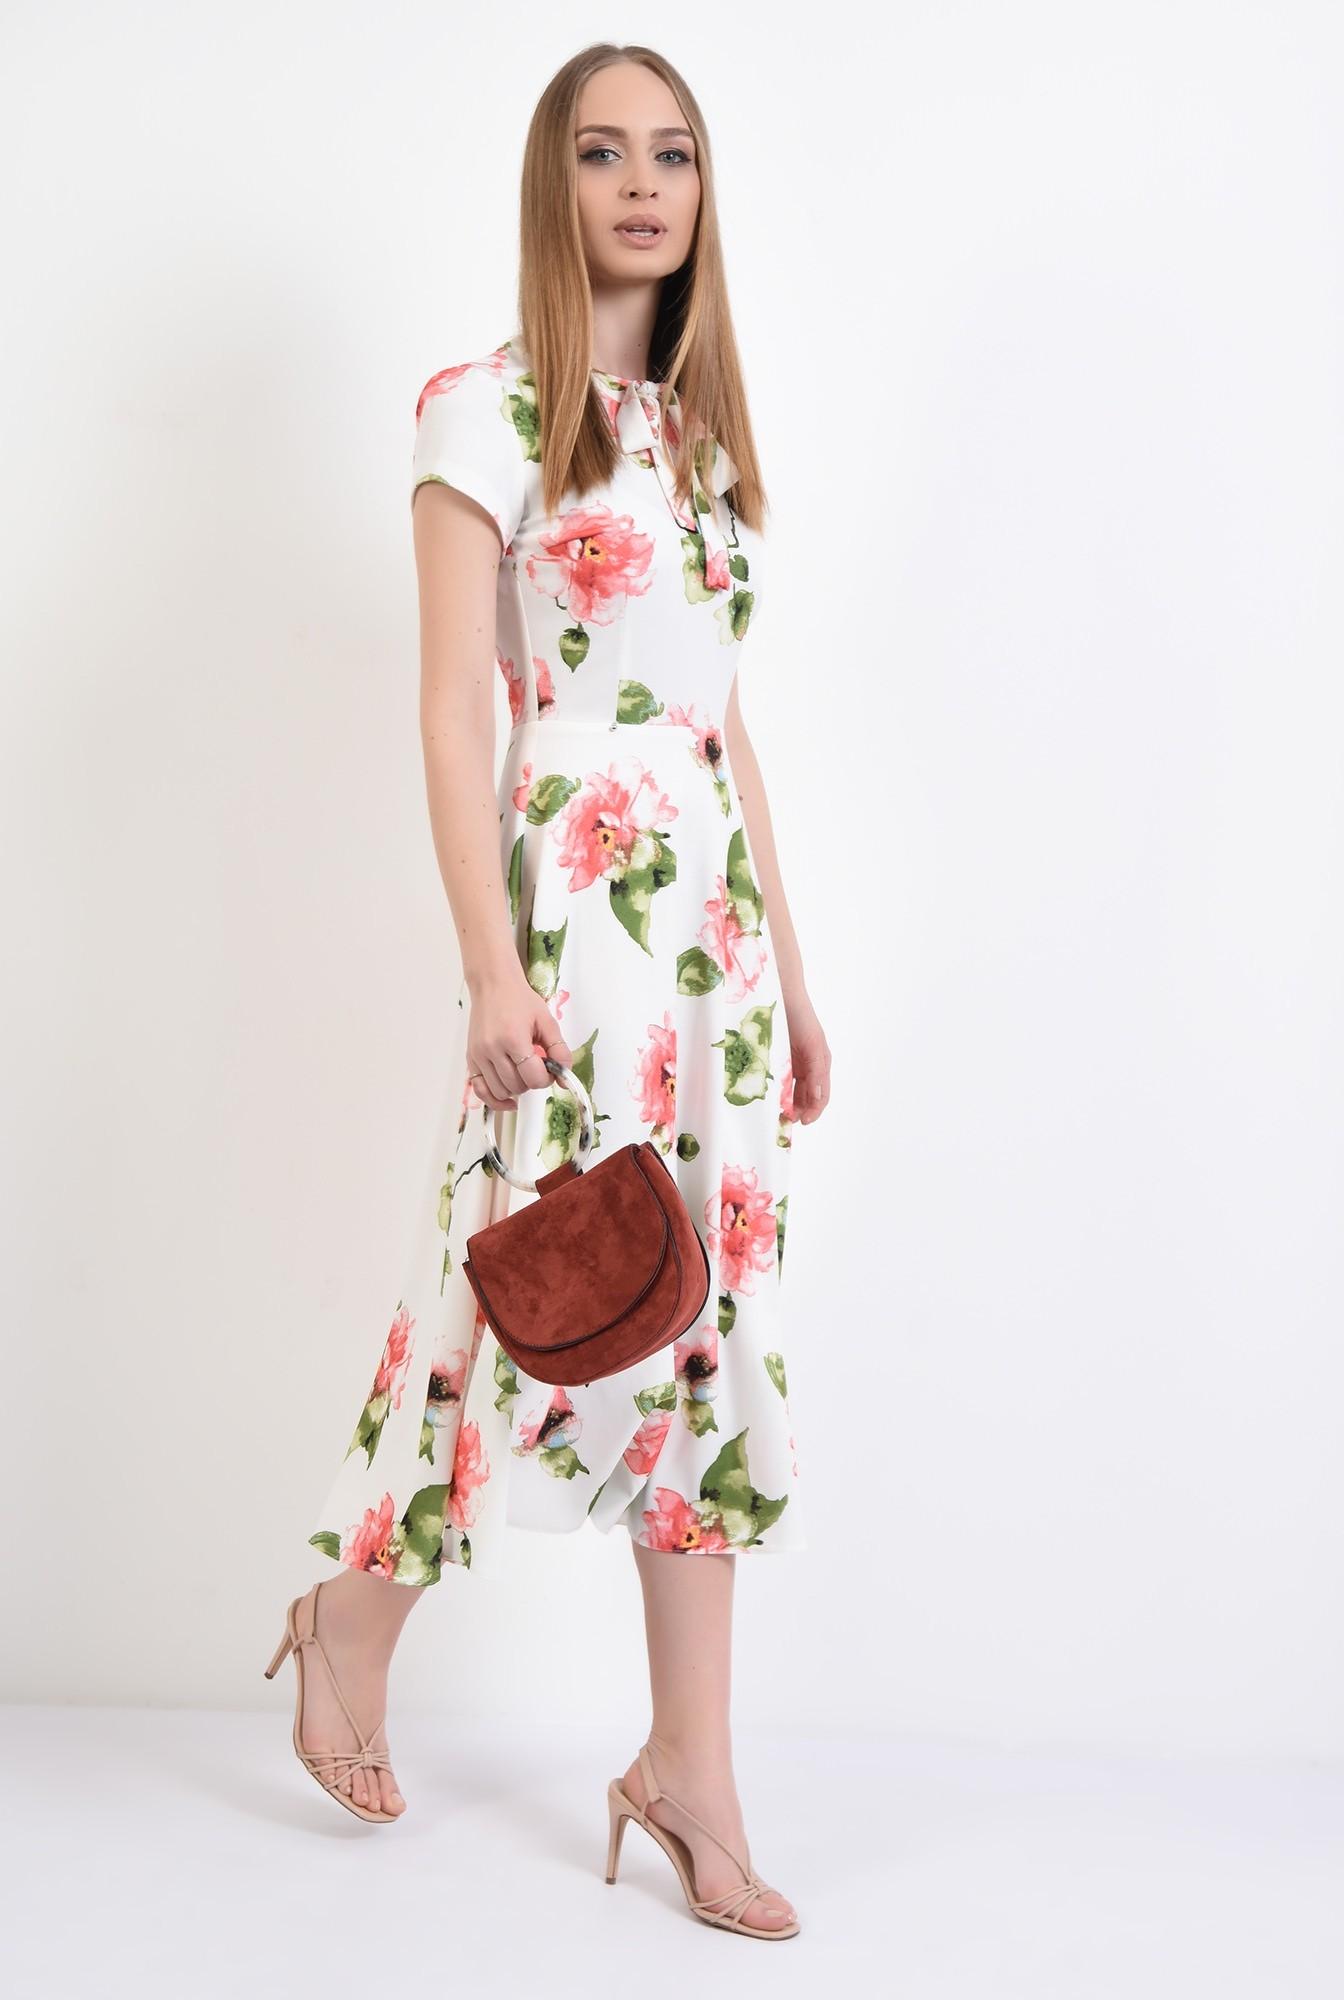 0 - 360 - rochie casual, midi,cu flori, Poema